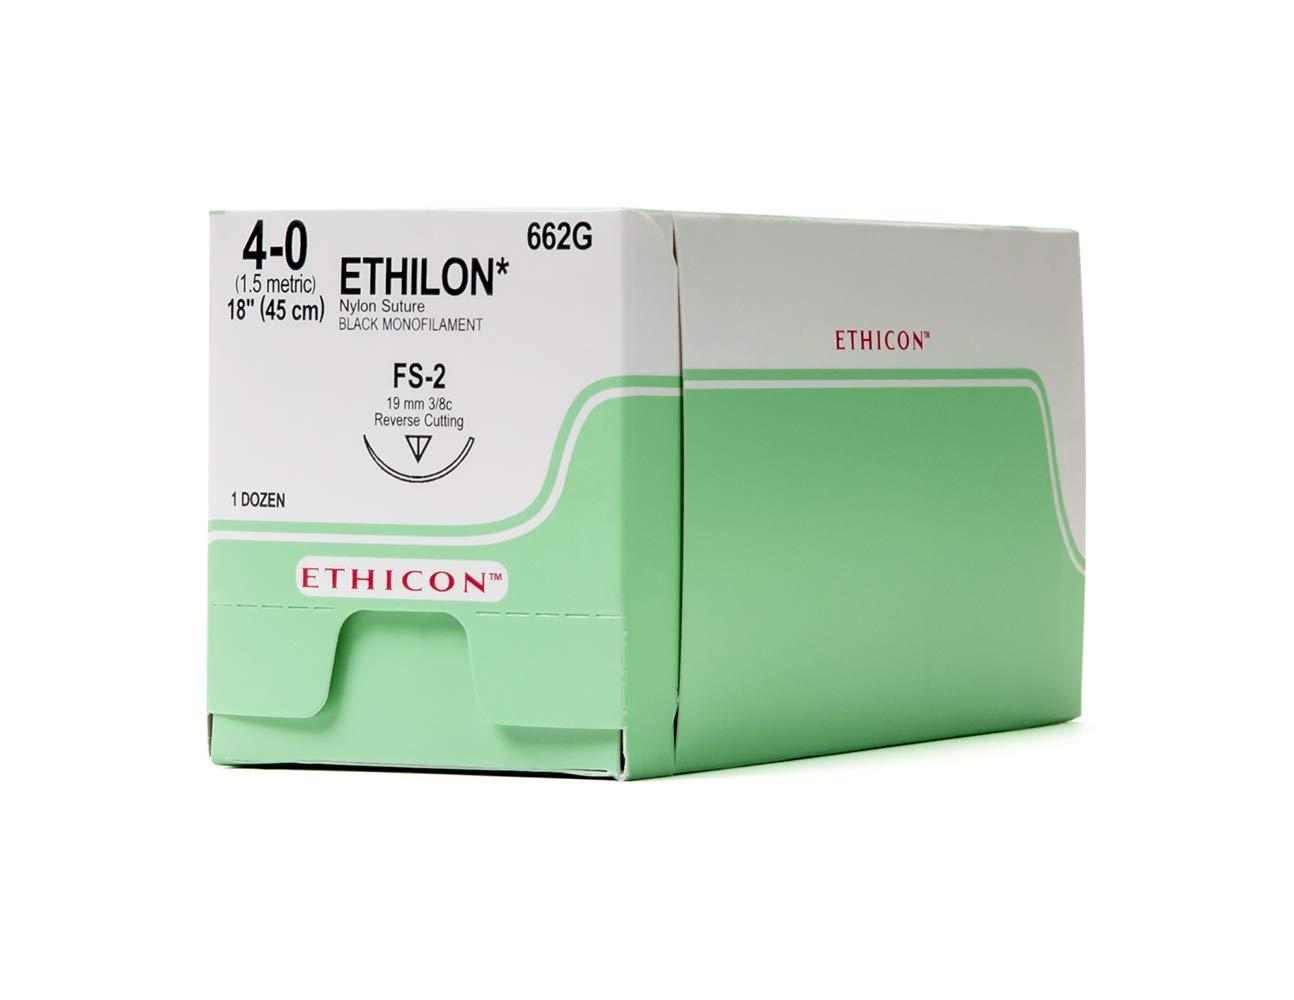 Ethicon ETHILON Nylon Suture, 662G, Synthetic Non-absorbable, FS-2 (19 mm), 3/8 Circle Needle, Size 4-0, 18'' (45 cm)